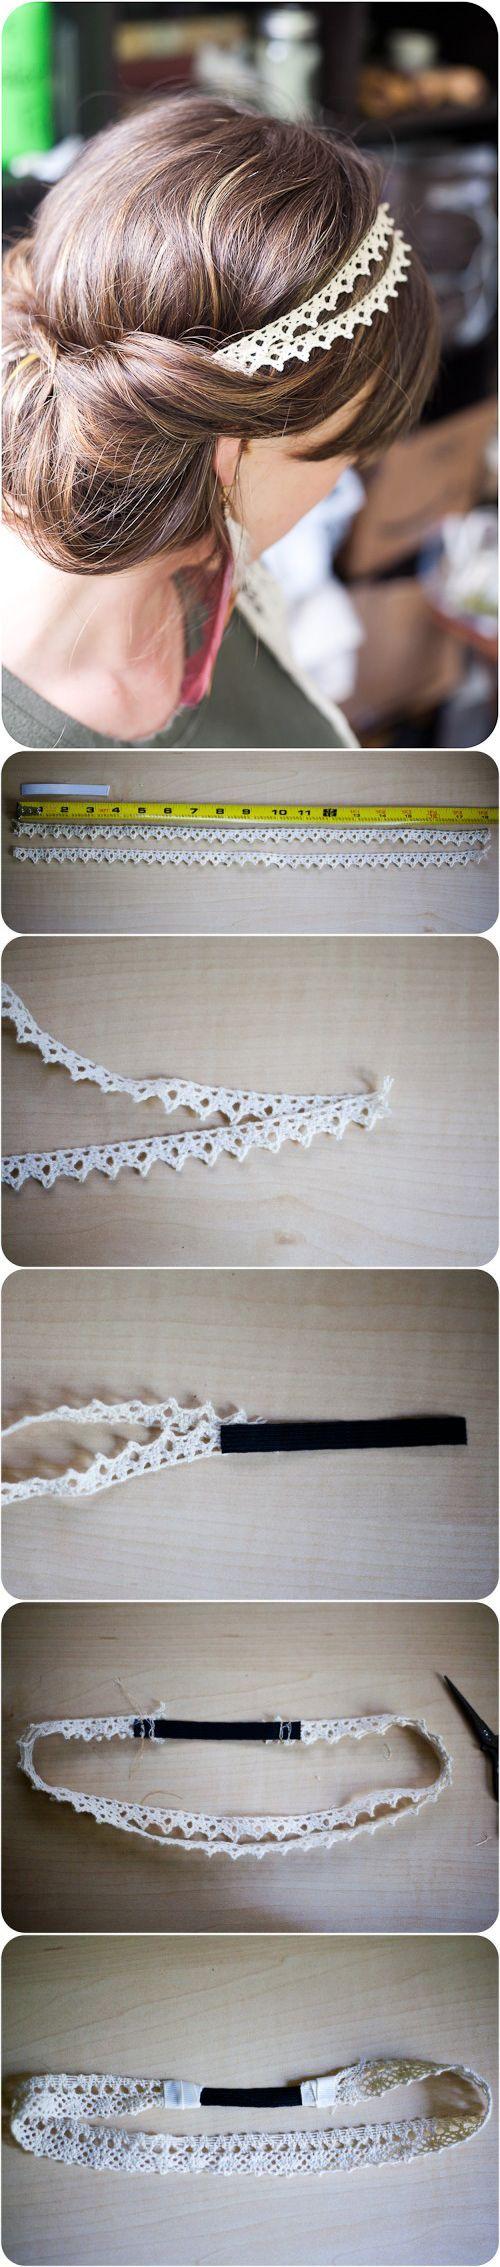 fabriquer headband tuto DIY